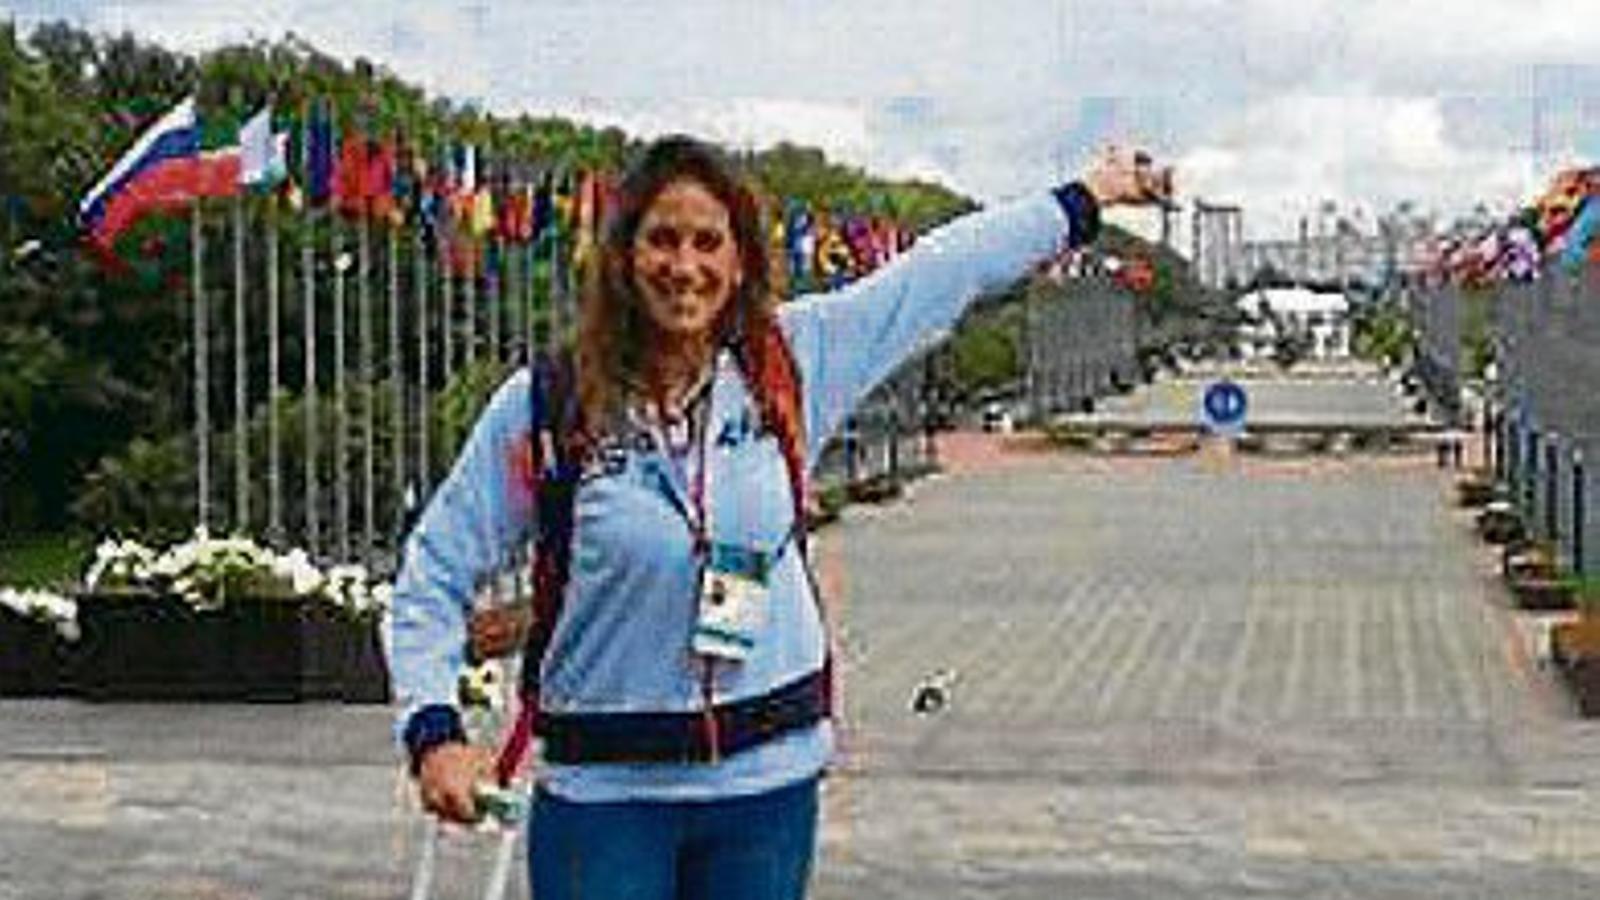 La catalana Érika Villaécija busca un bitllet per a Rio 2016.